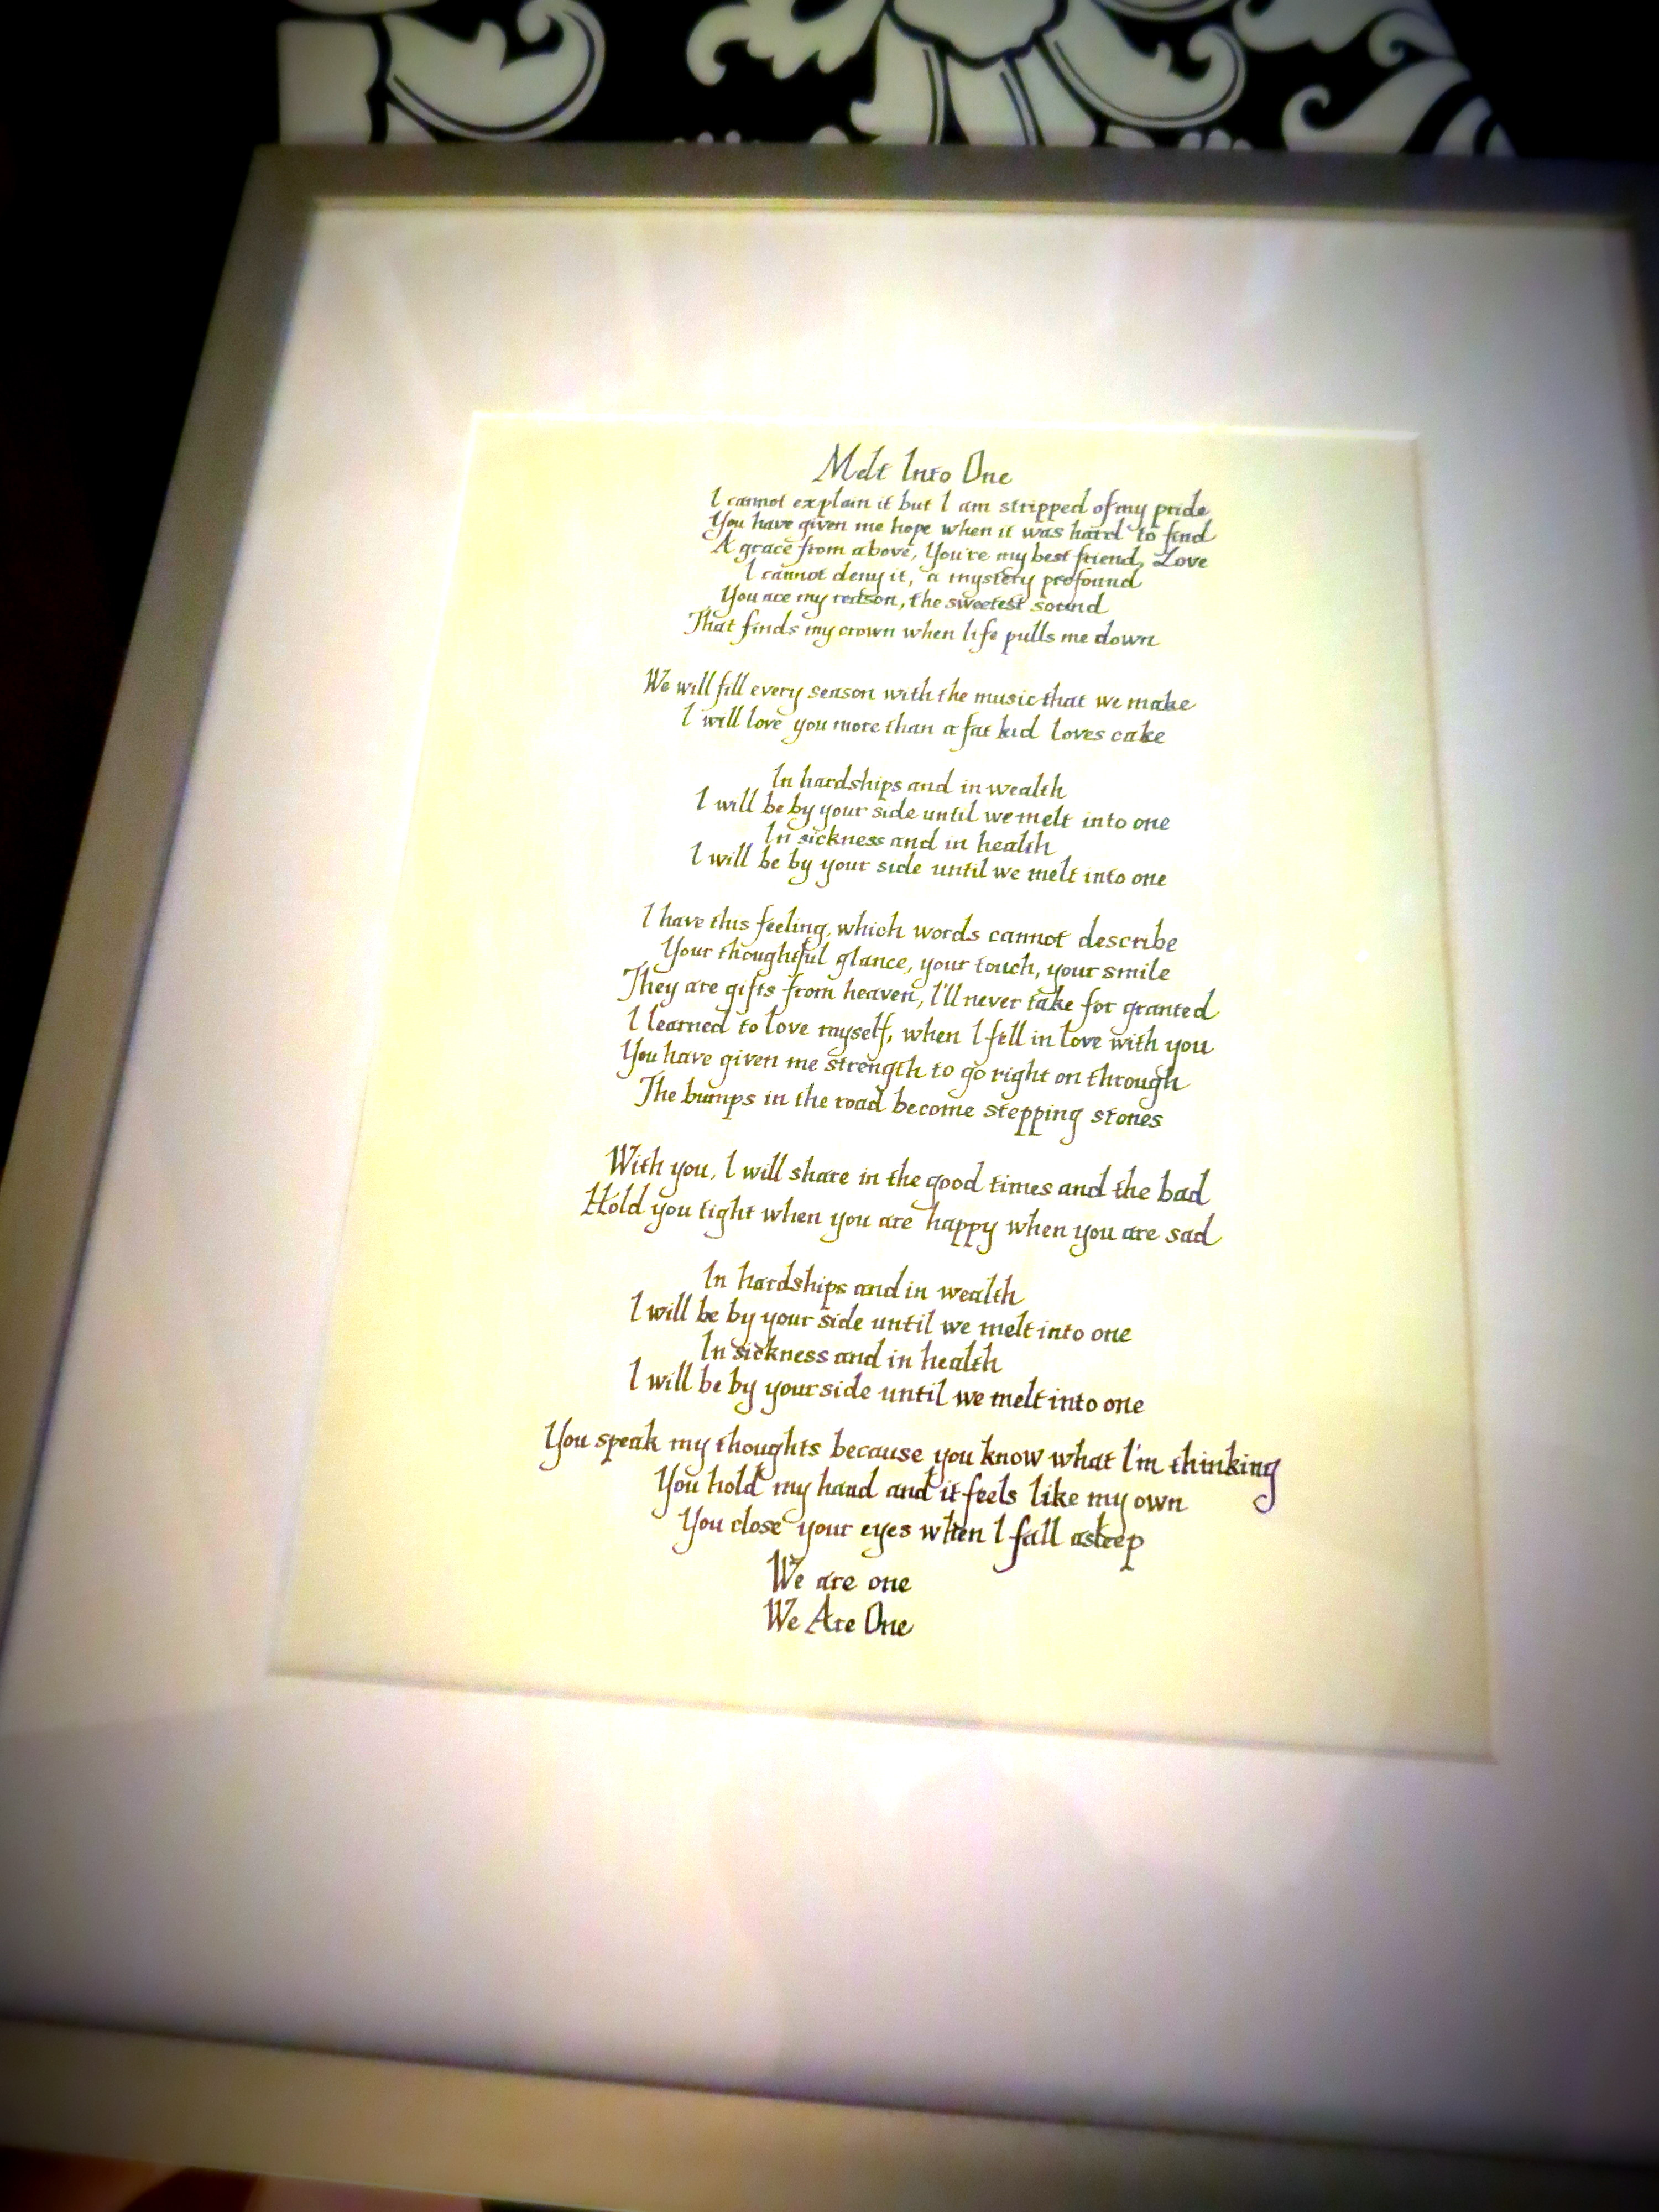 Wedding Gift Message To Groom : Heartfelt Message To The Bride. Wedding Message Of Bride To Groom ...